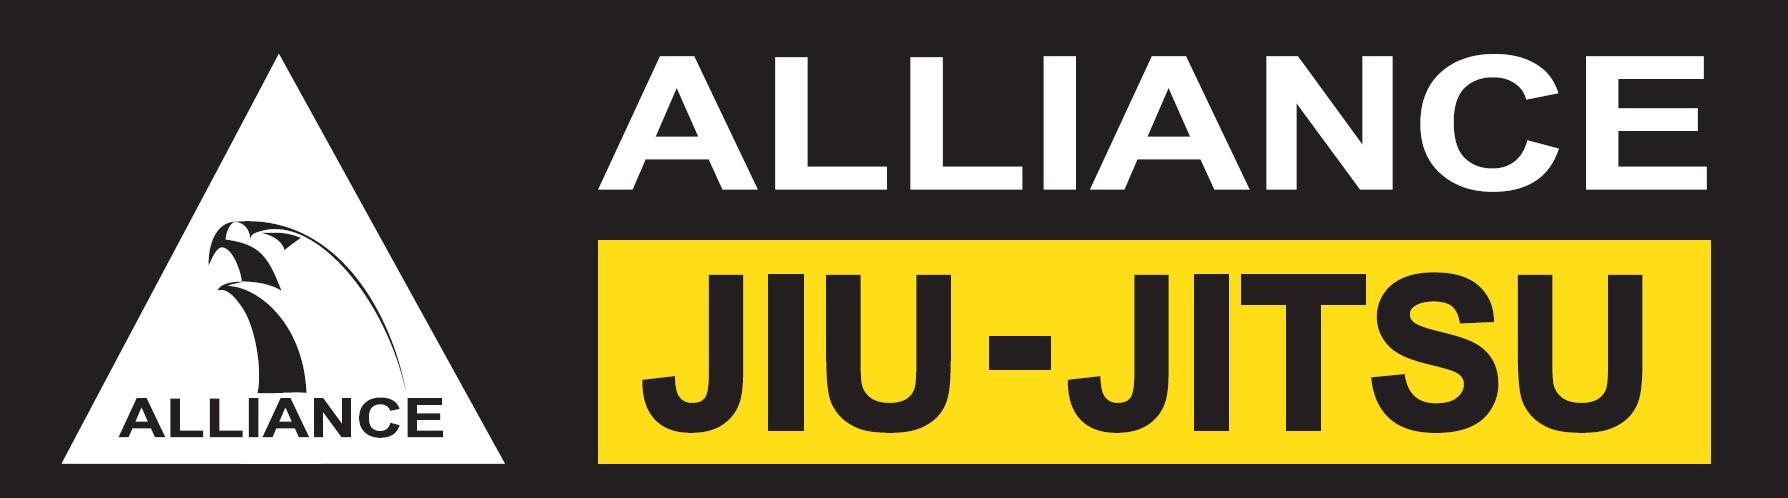 Alliance Jiu-Jitsu Carlsbad